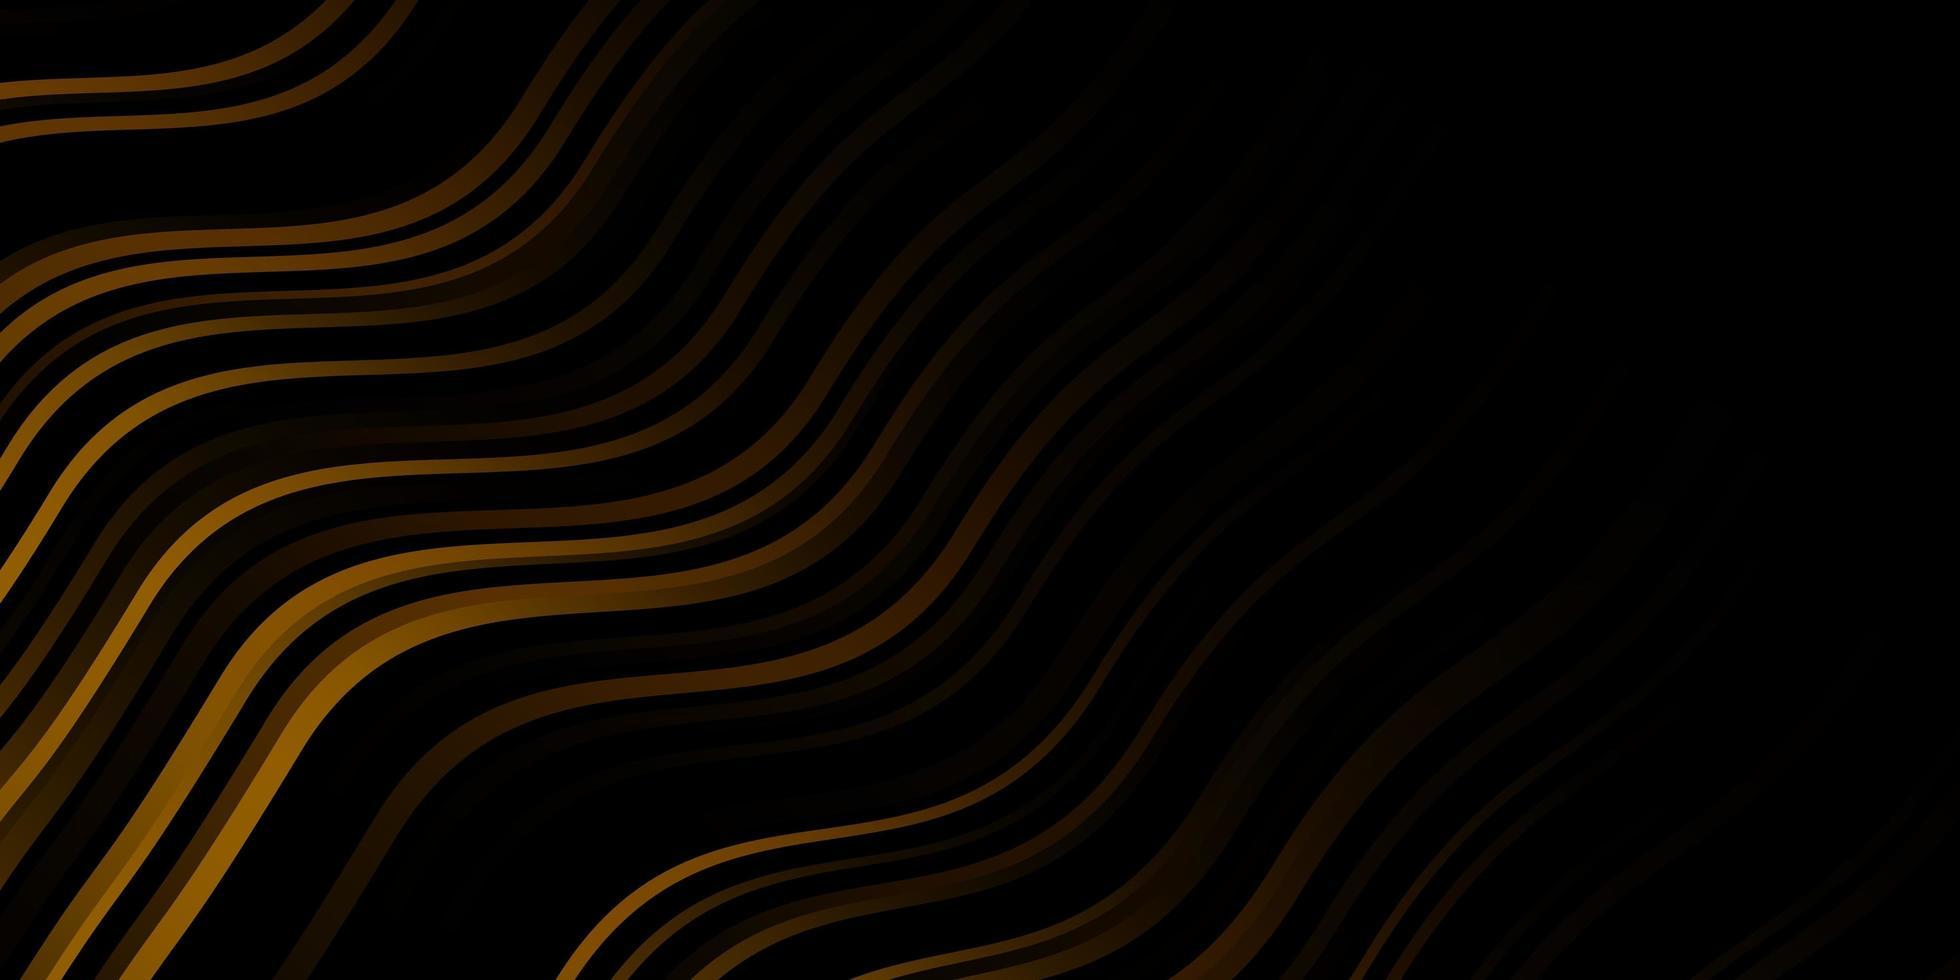 diseño de vector amarillo oscuro con curvas.